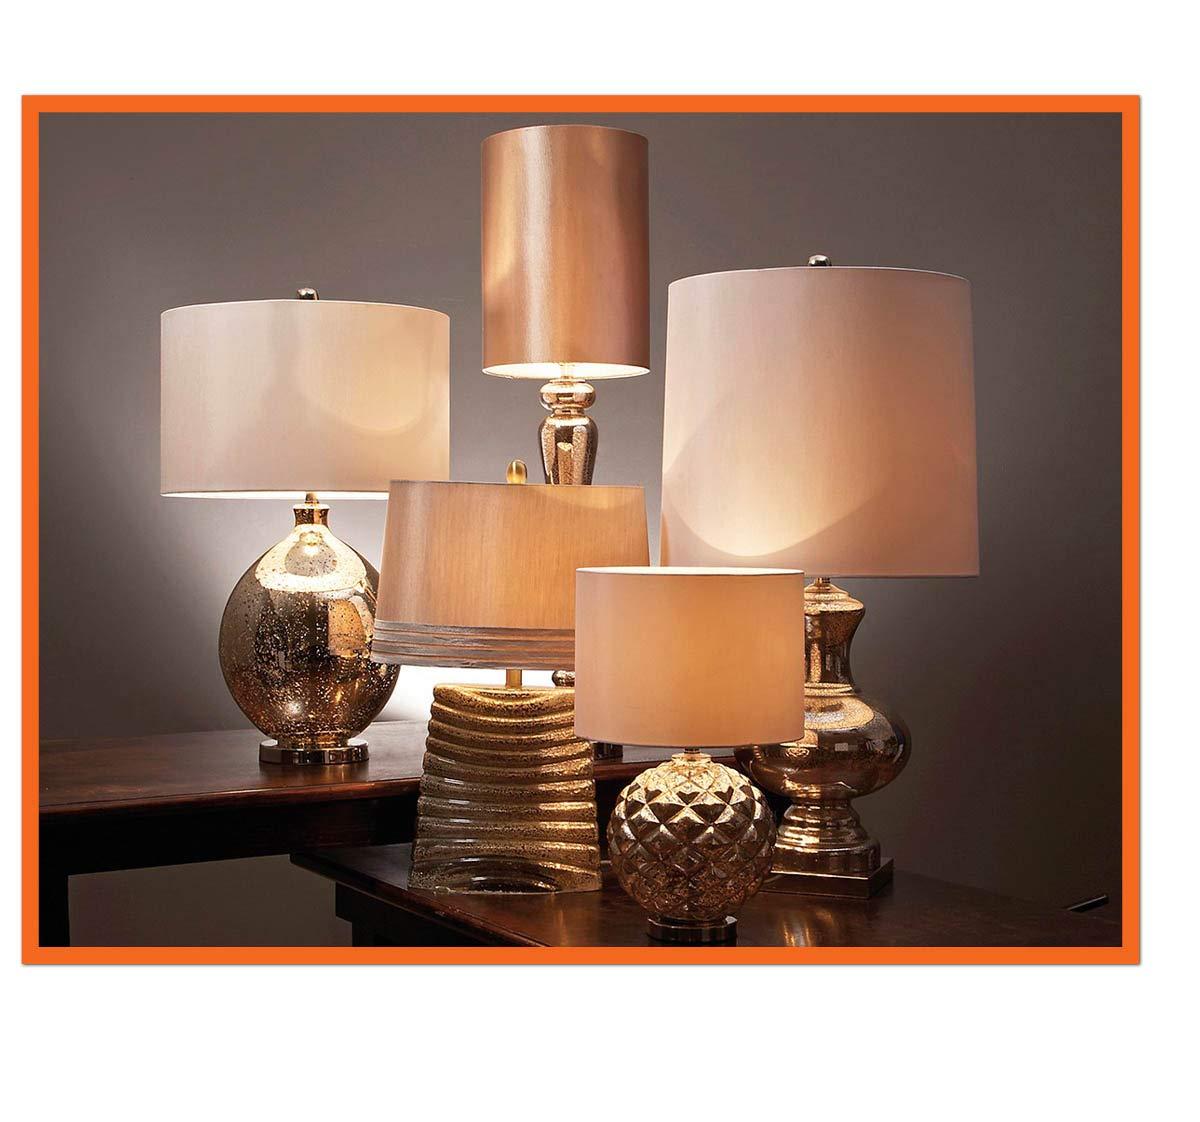 Urban Designs 1310668 Regina 40-Inch Tall Antique Mercury Glass Table Lamp Silver